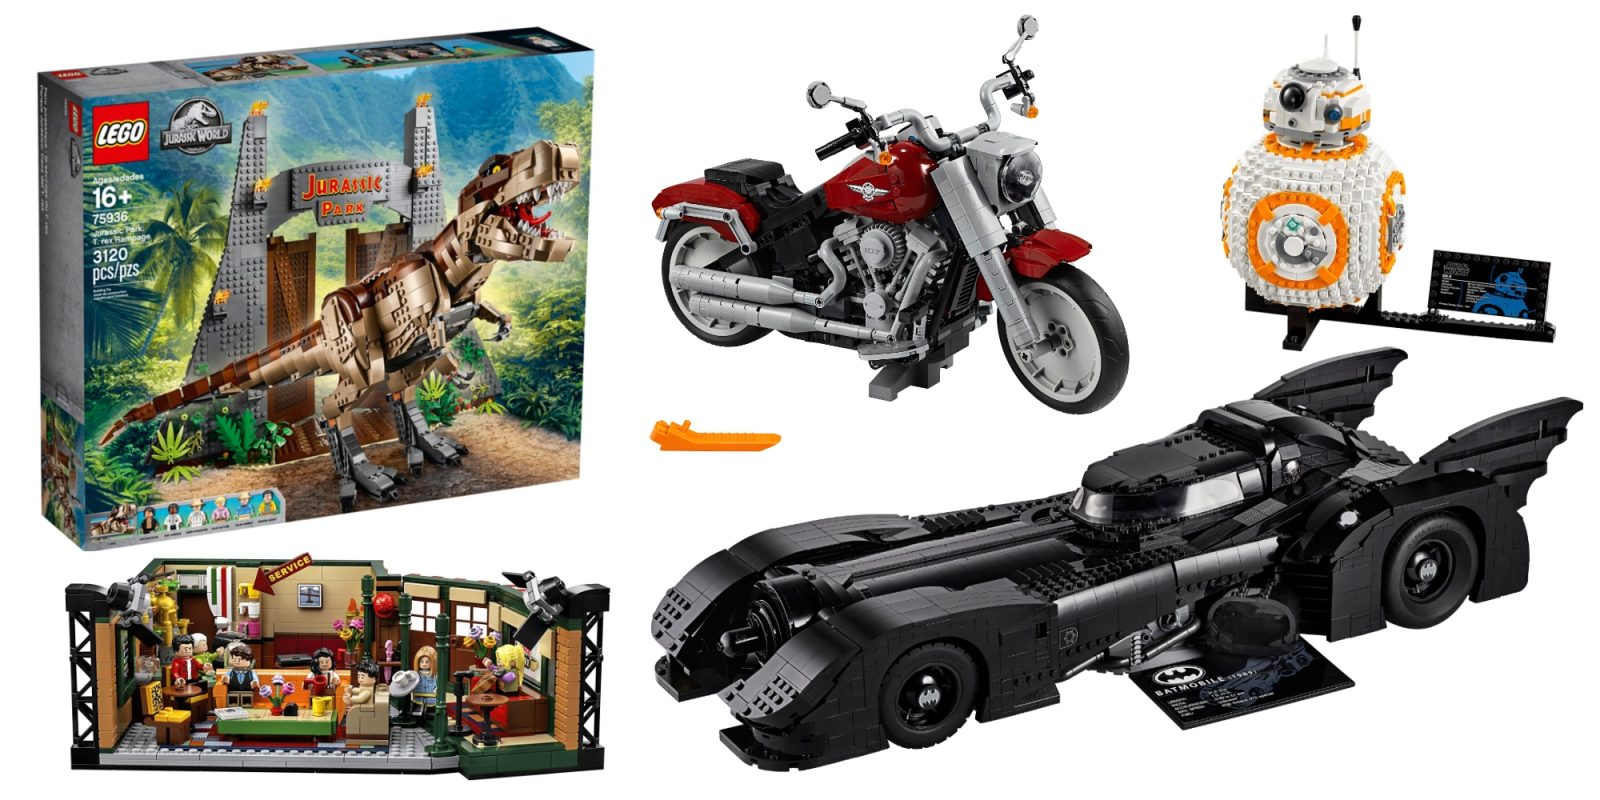 LEGO launches rare extra 30% off sale: 1989 Batmobile $175, Harley-Davidson $70, more